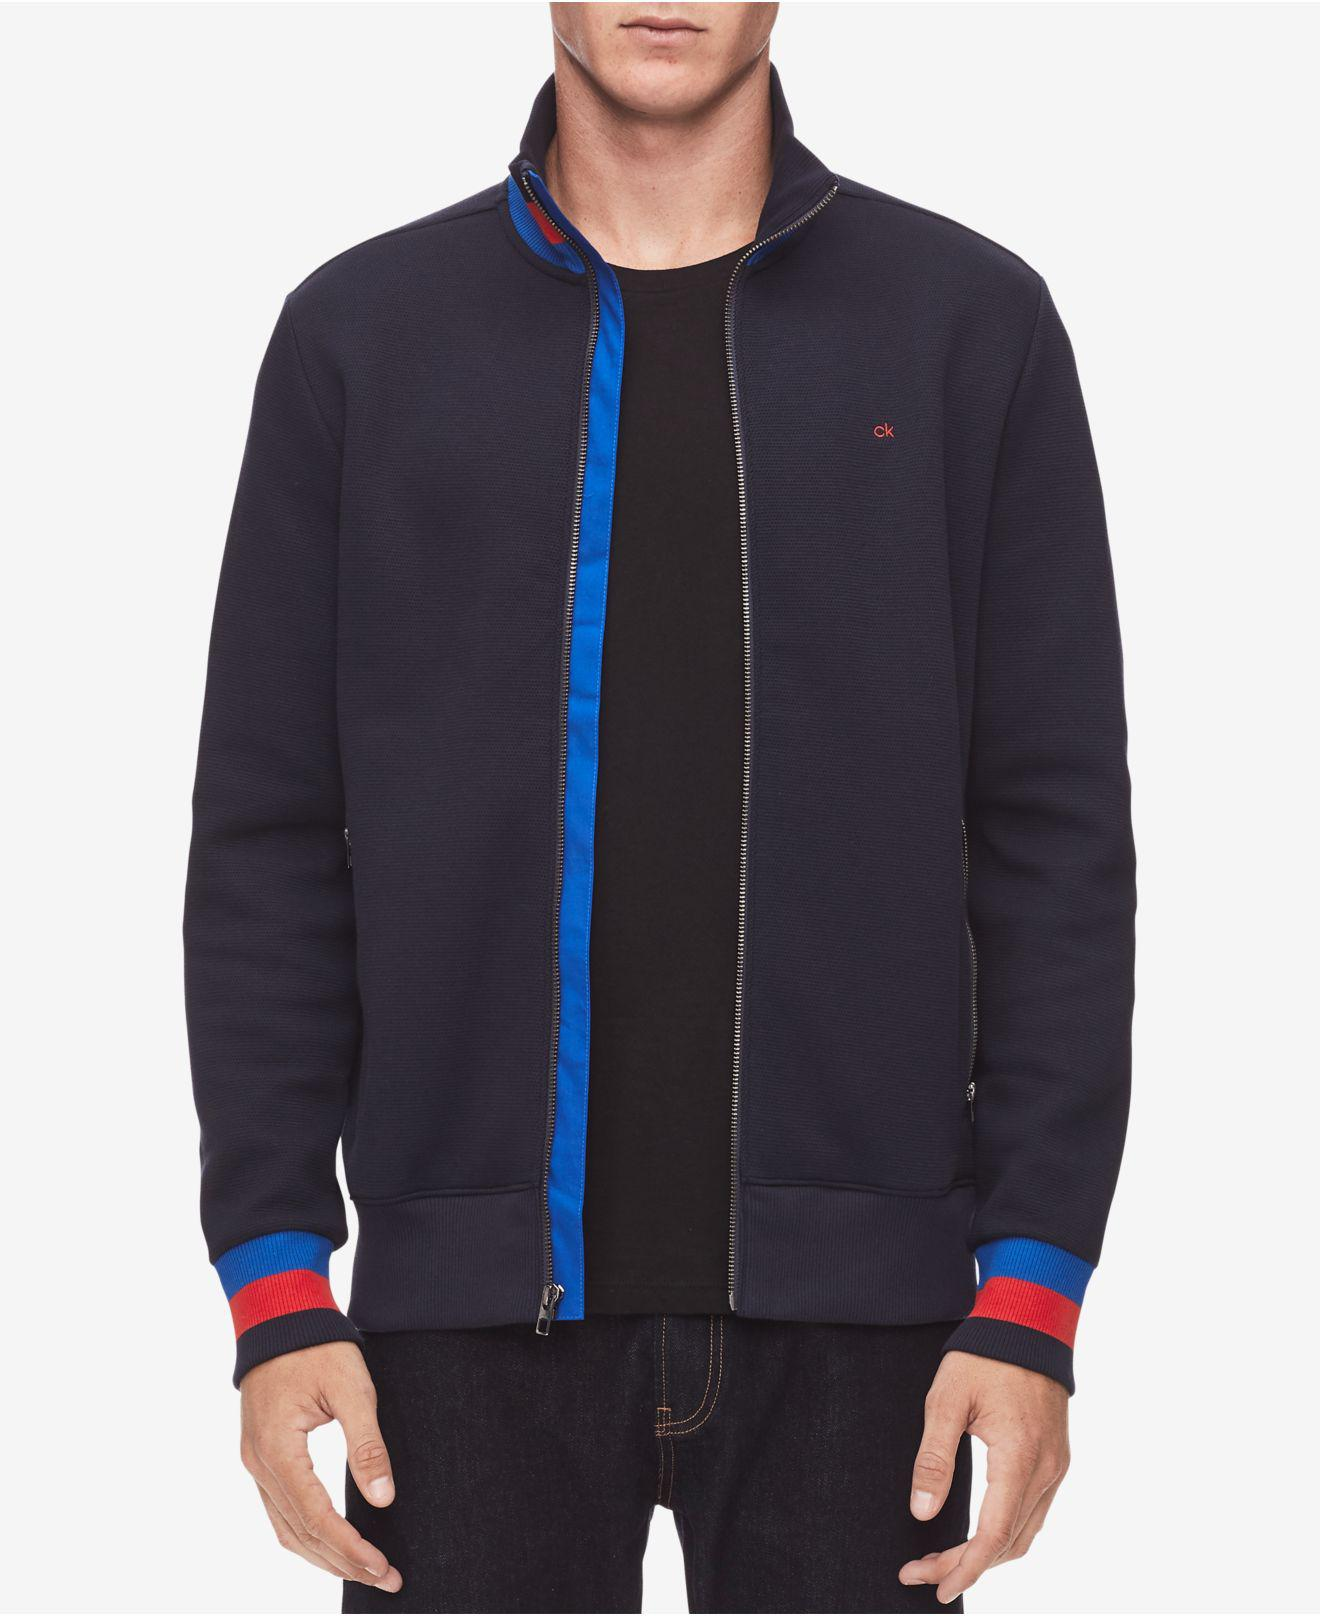 dc1d4bd61607 Lyst - Calvin Klein Full-zip Sweater in Blue for Men